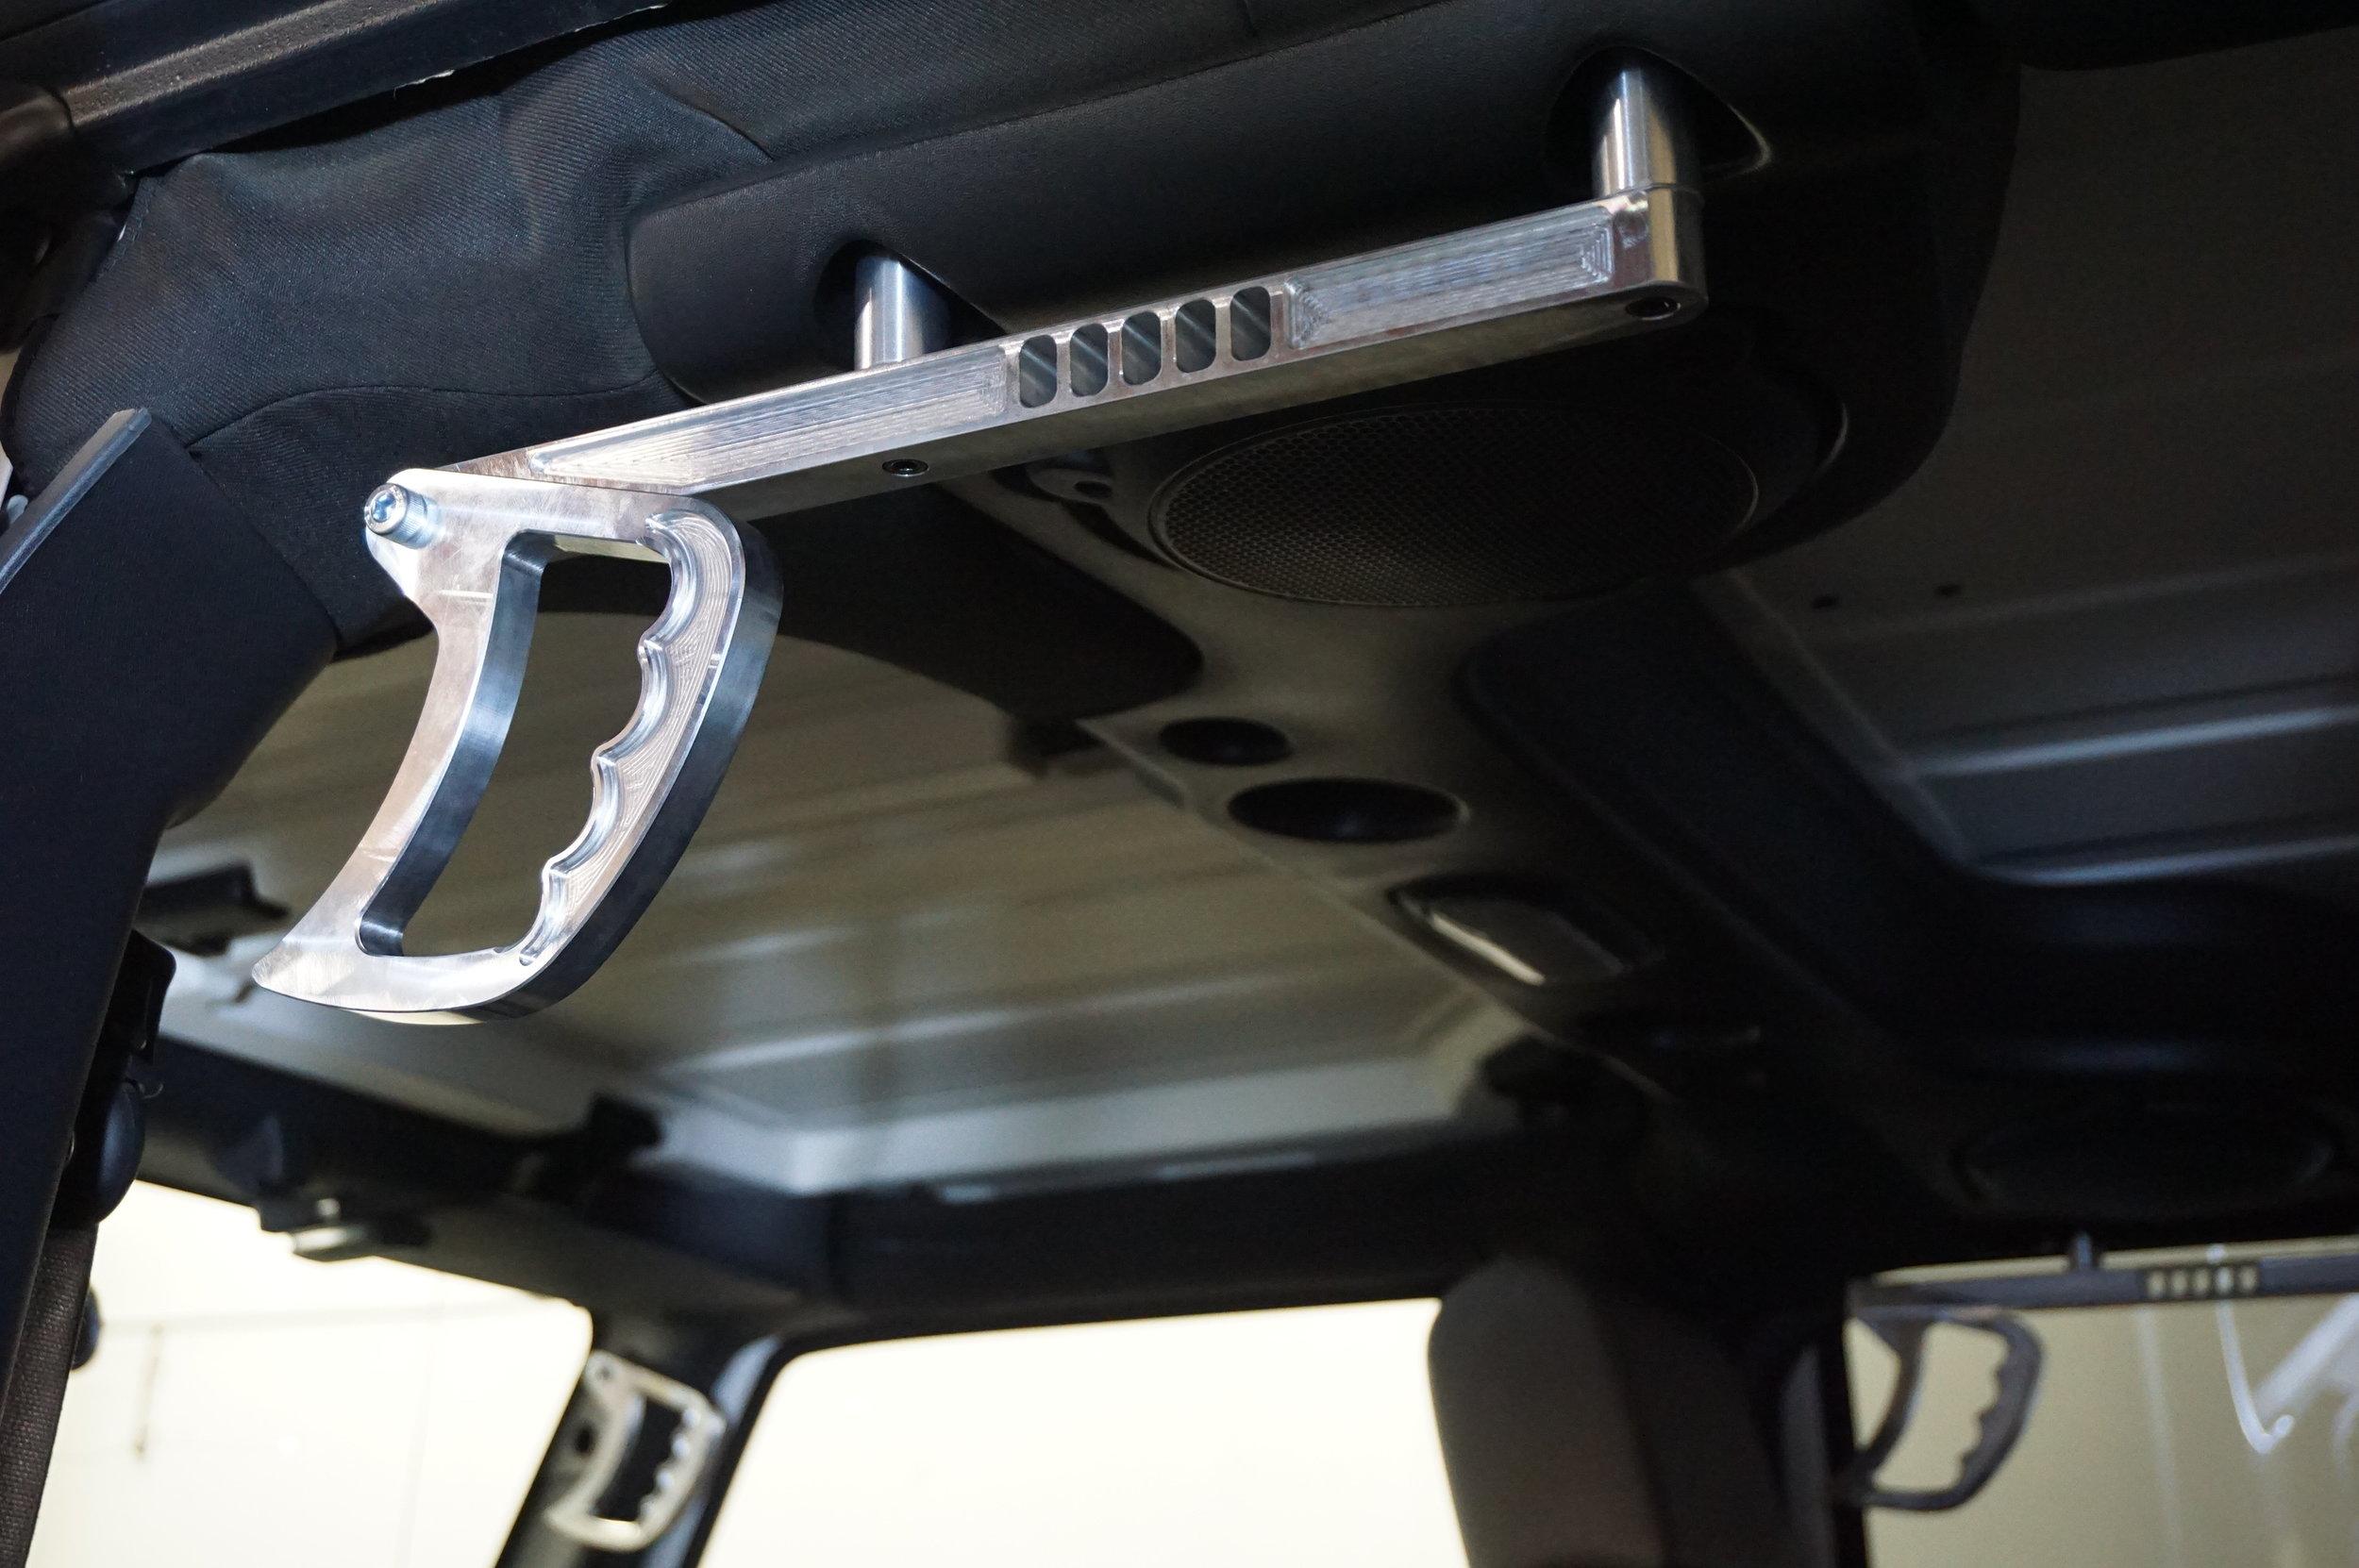 Jeep Wrangler JK interior grab handles